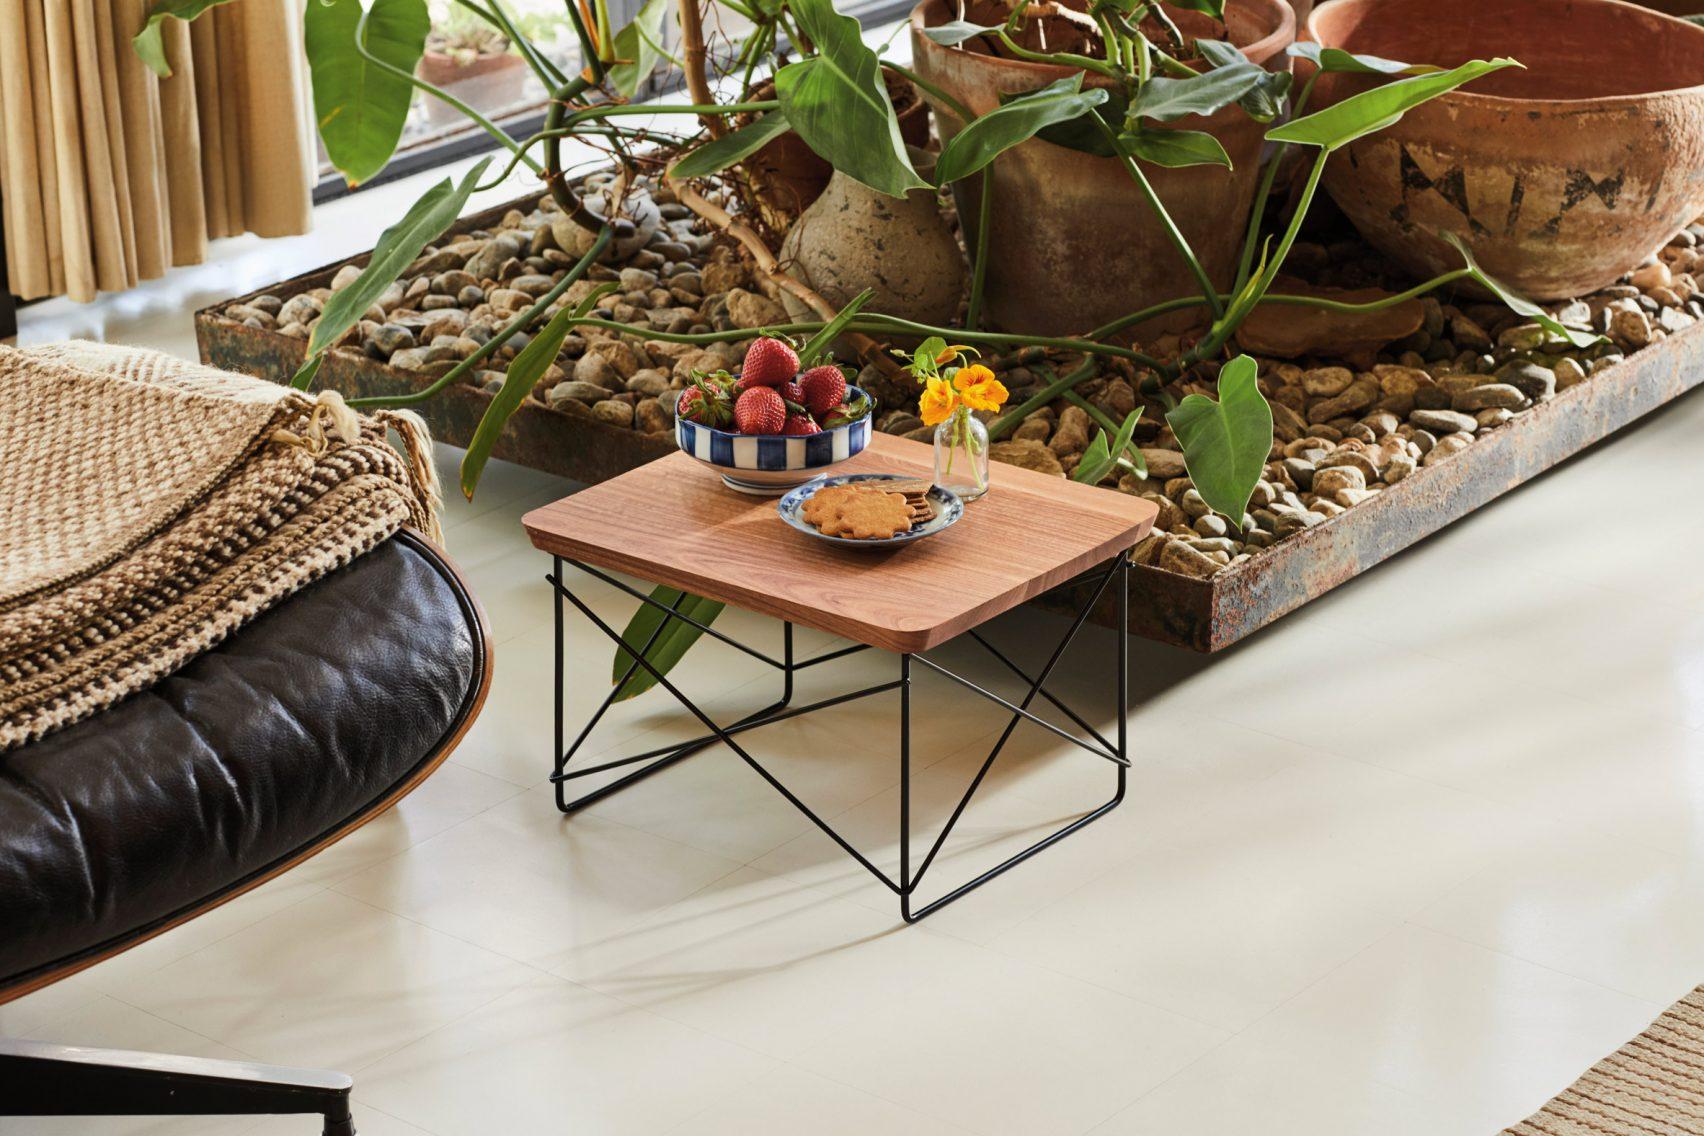 vitra-herman-miller-eames-eucalyptus-ltr-tables-_dezeen_2364_col_12-1704x1136.jpg